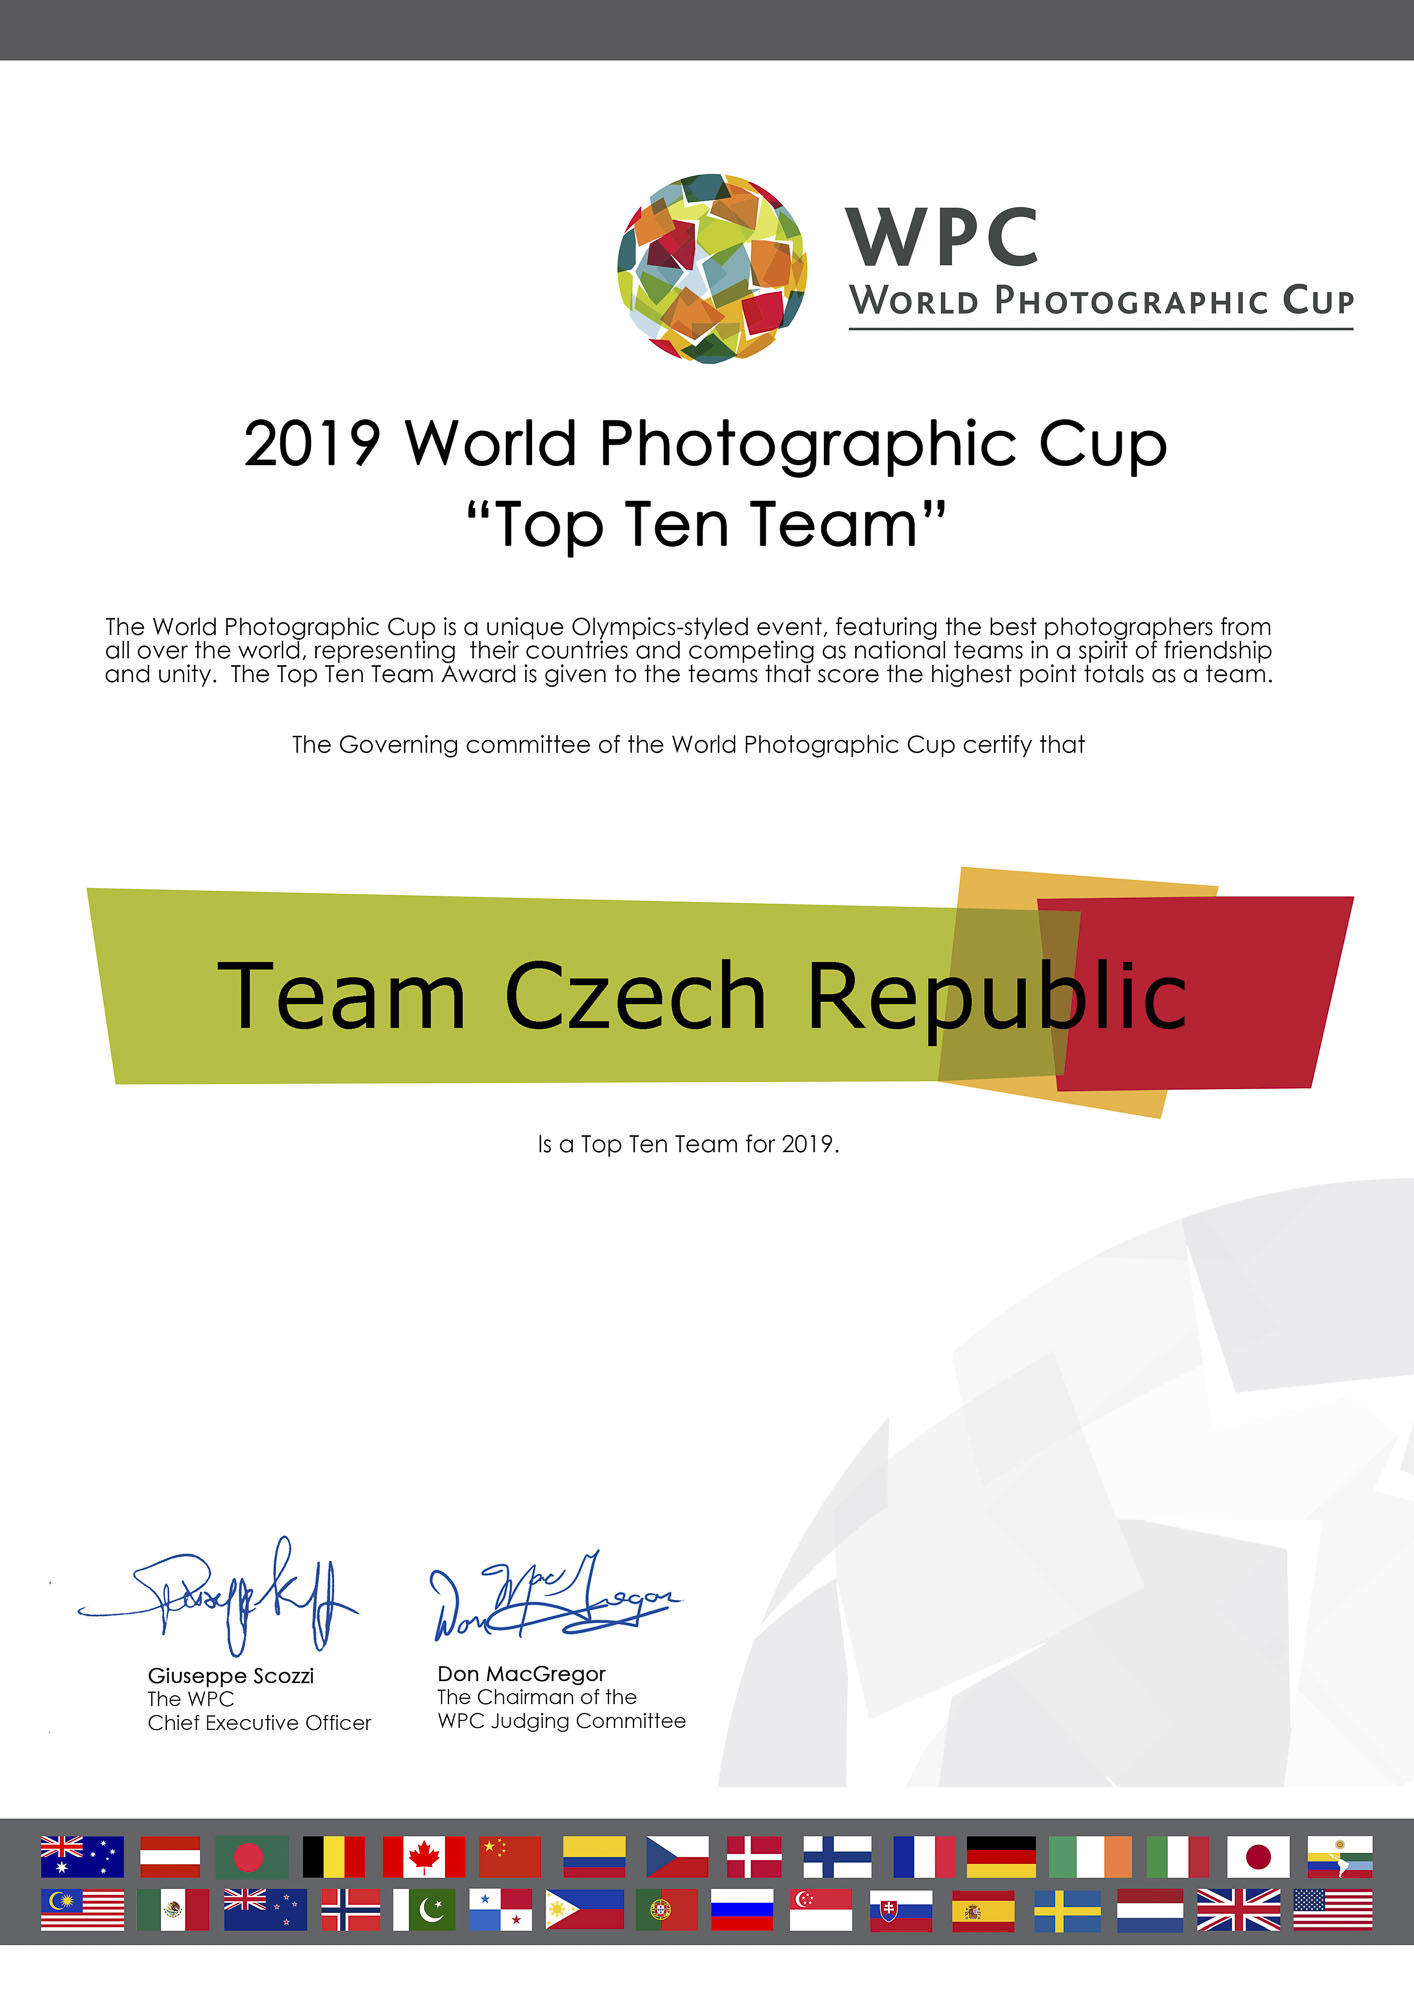 Náš tým v Top 10 WPC 2019 a Richard Horák bronzový v kategorii Příroda!